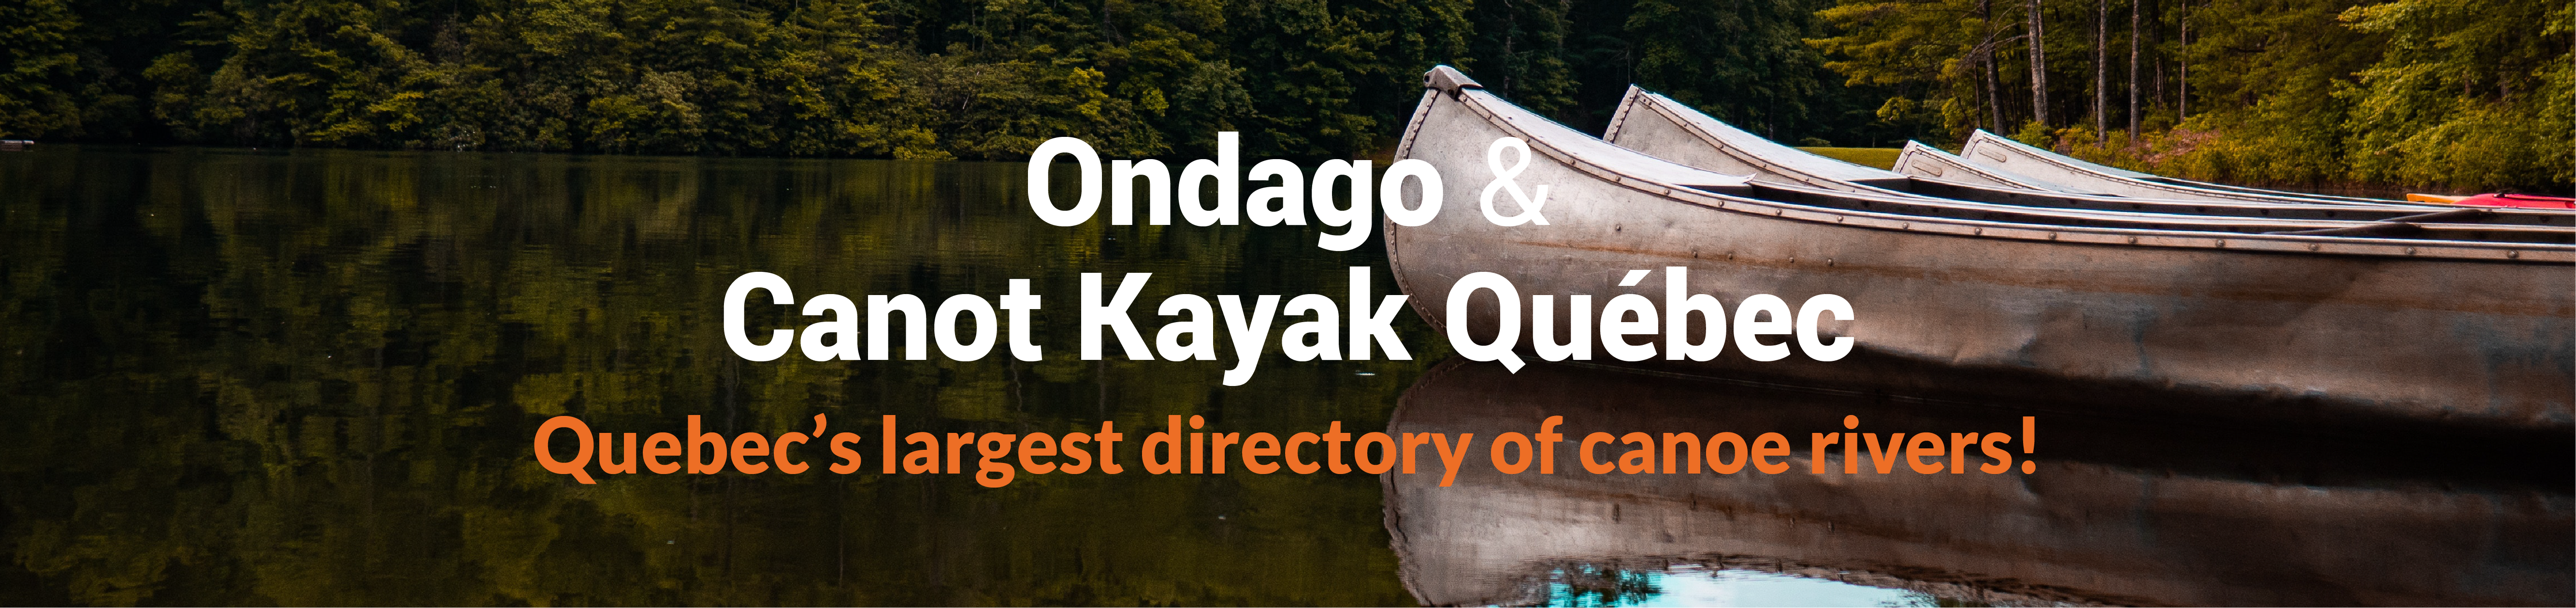 Quebec's largest directory of canoe rivers Canot Kayak Québec